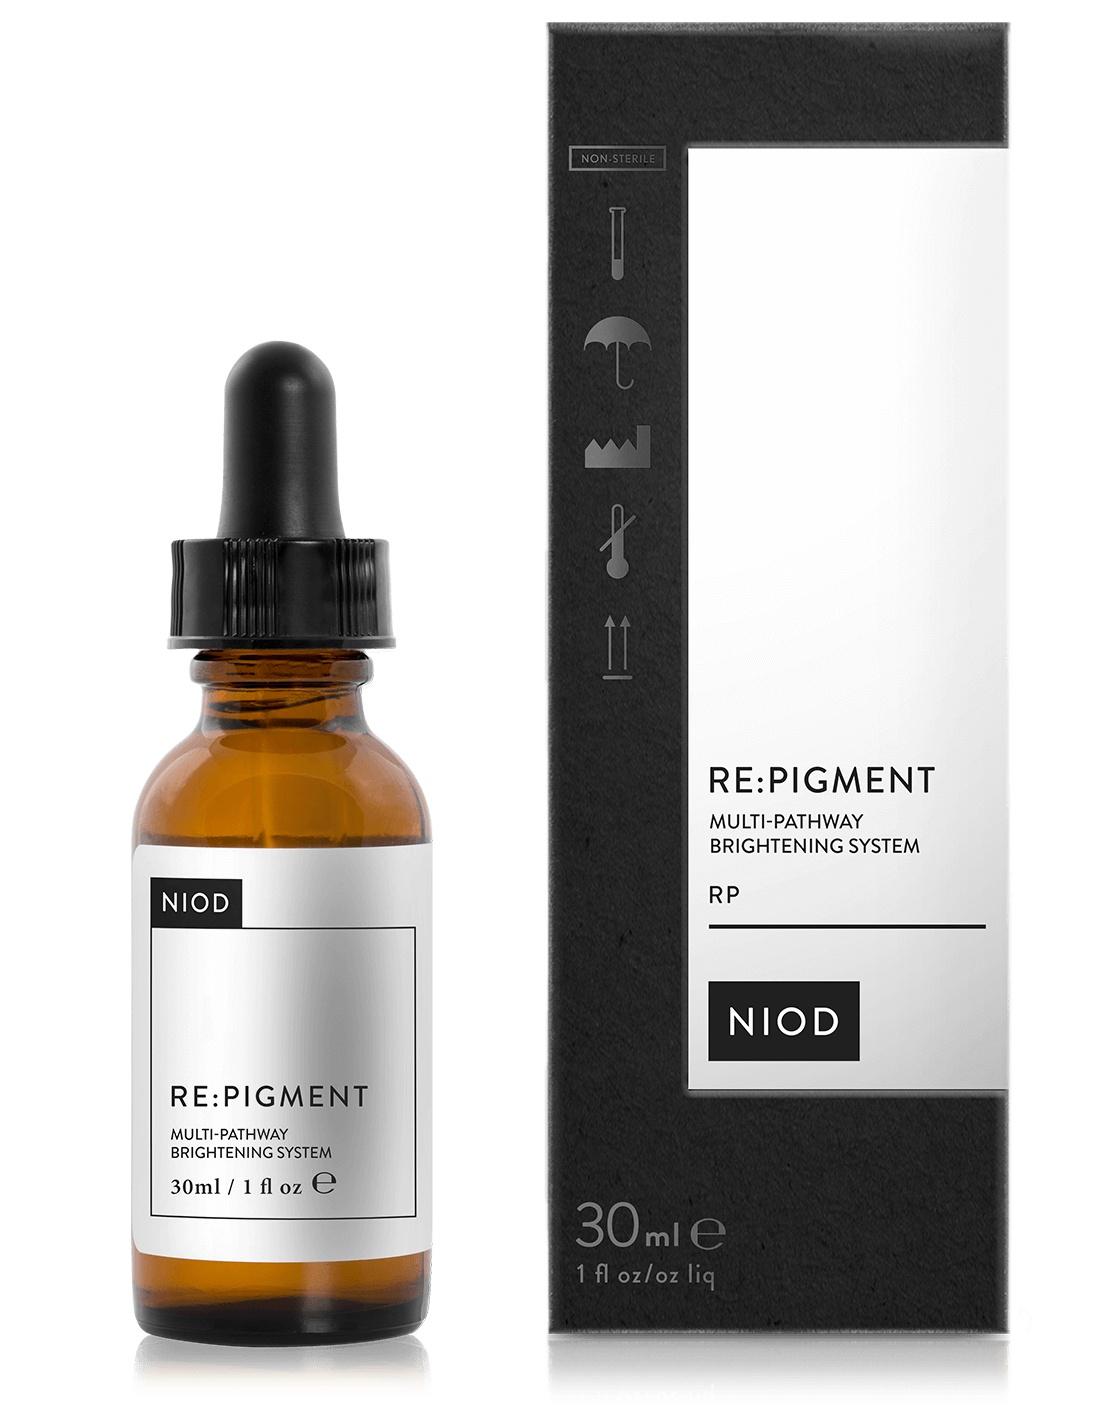 NIOD Re: Pigment